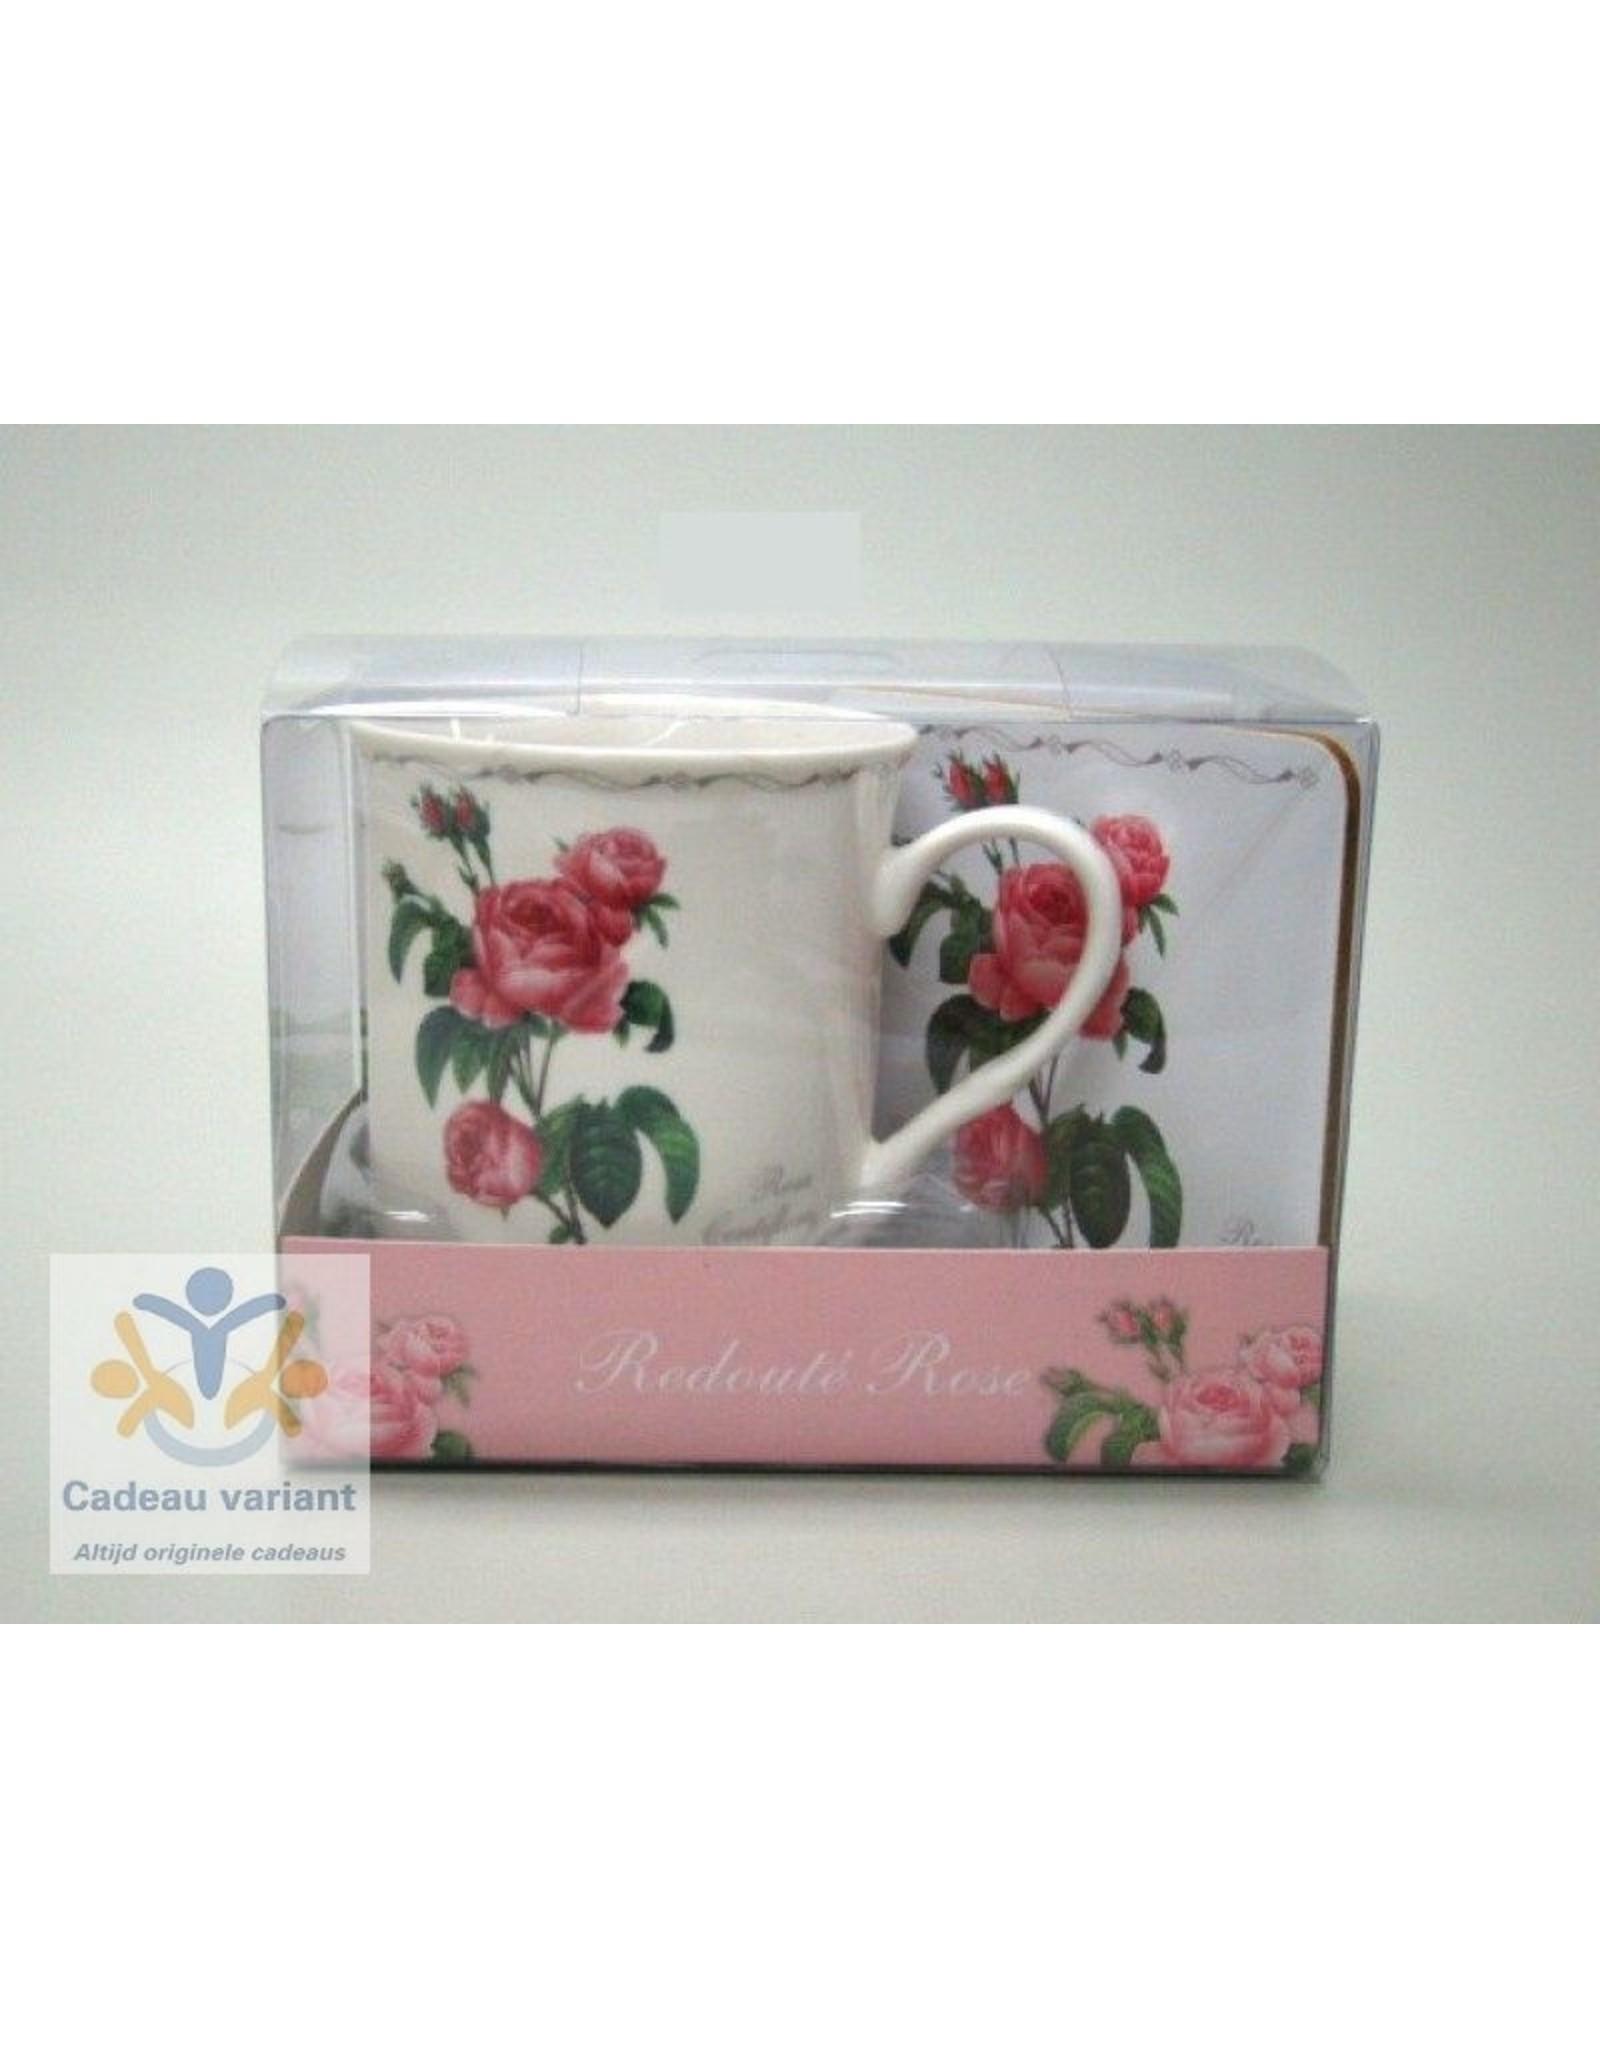 Roos Redouté Rose cadeauset